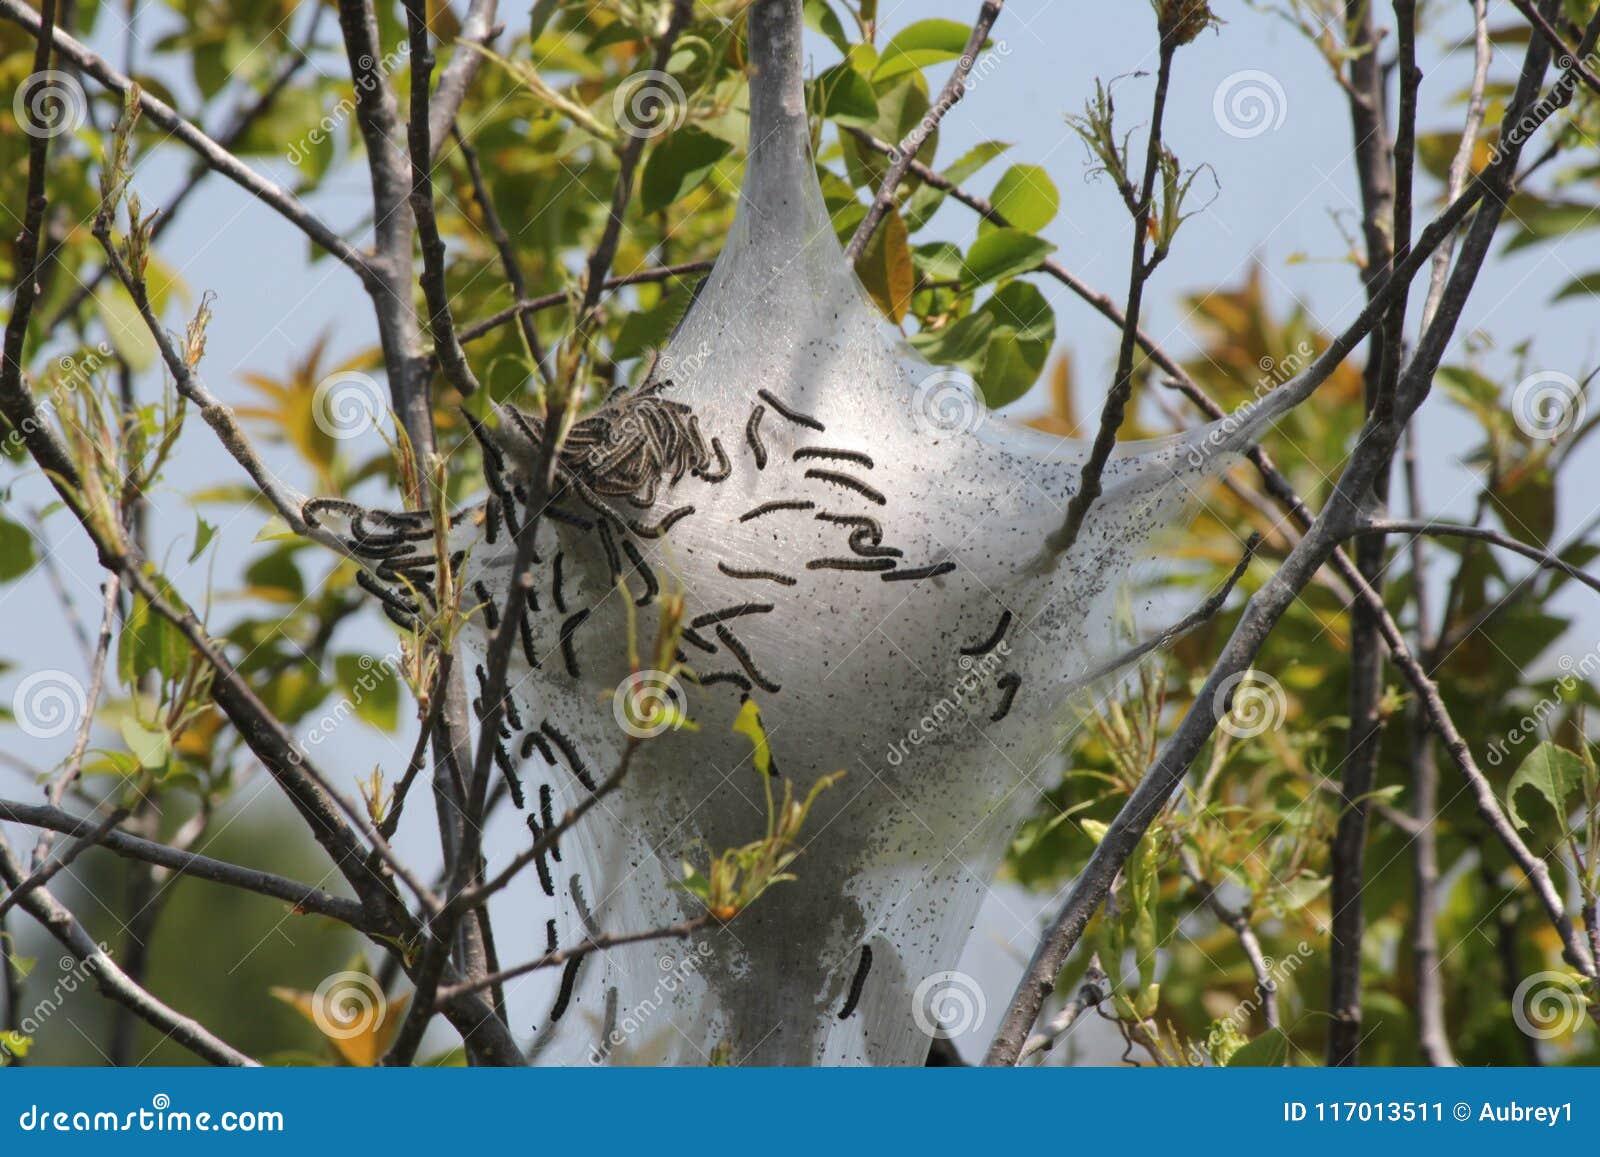 Eastern tent Caterpillar Malacosoma americanum & Eastern Tent Caterpillar Malacosoma Americanum Stock Image - Image ...